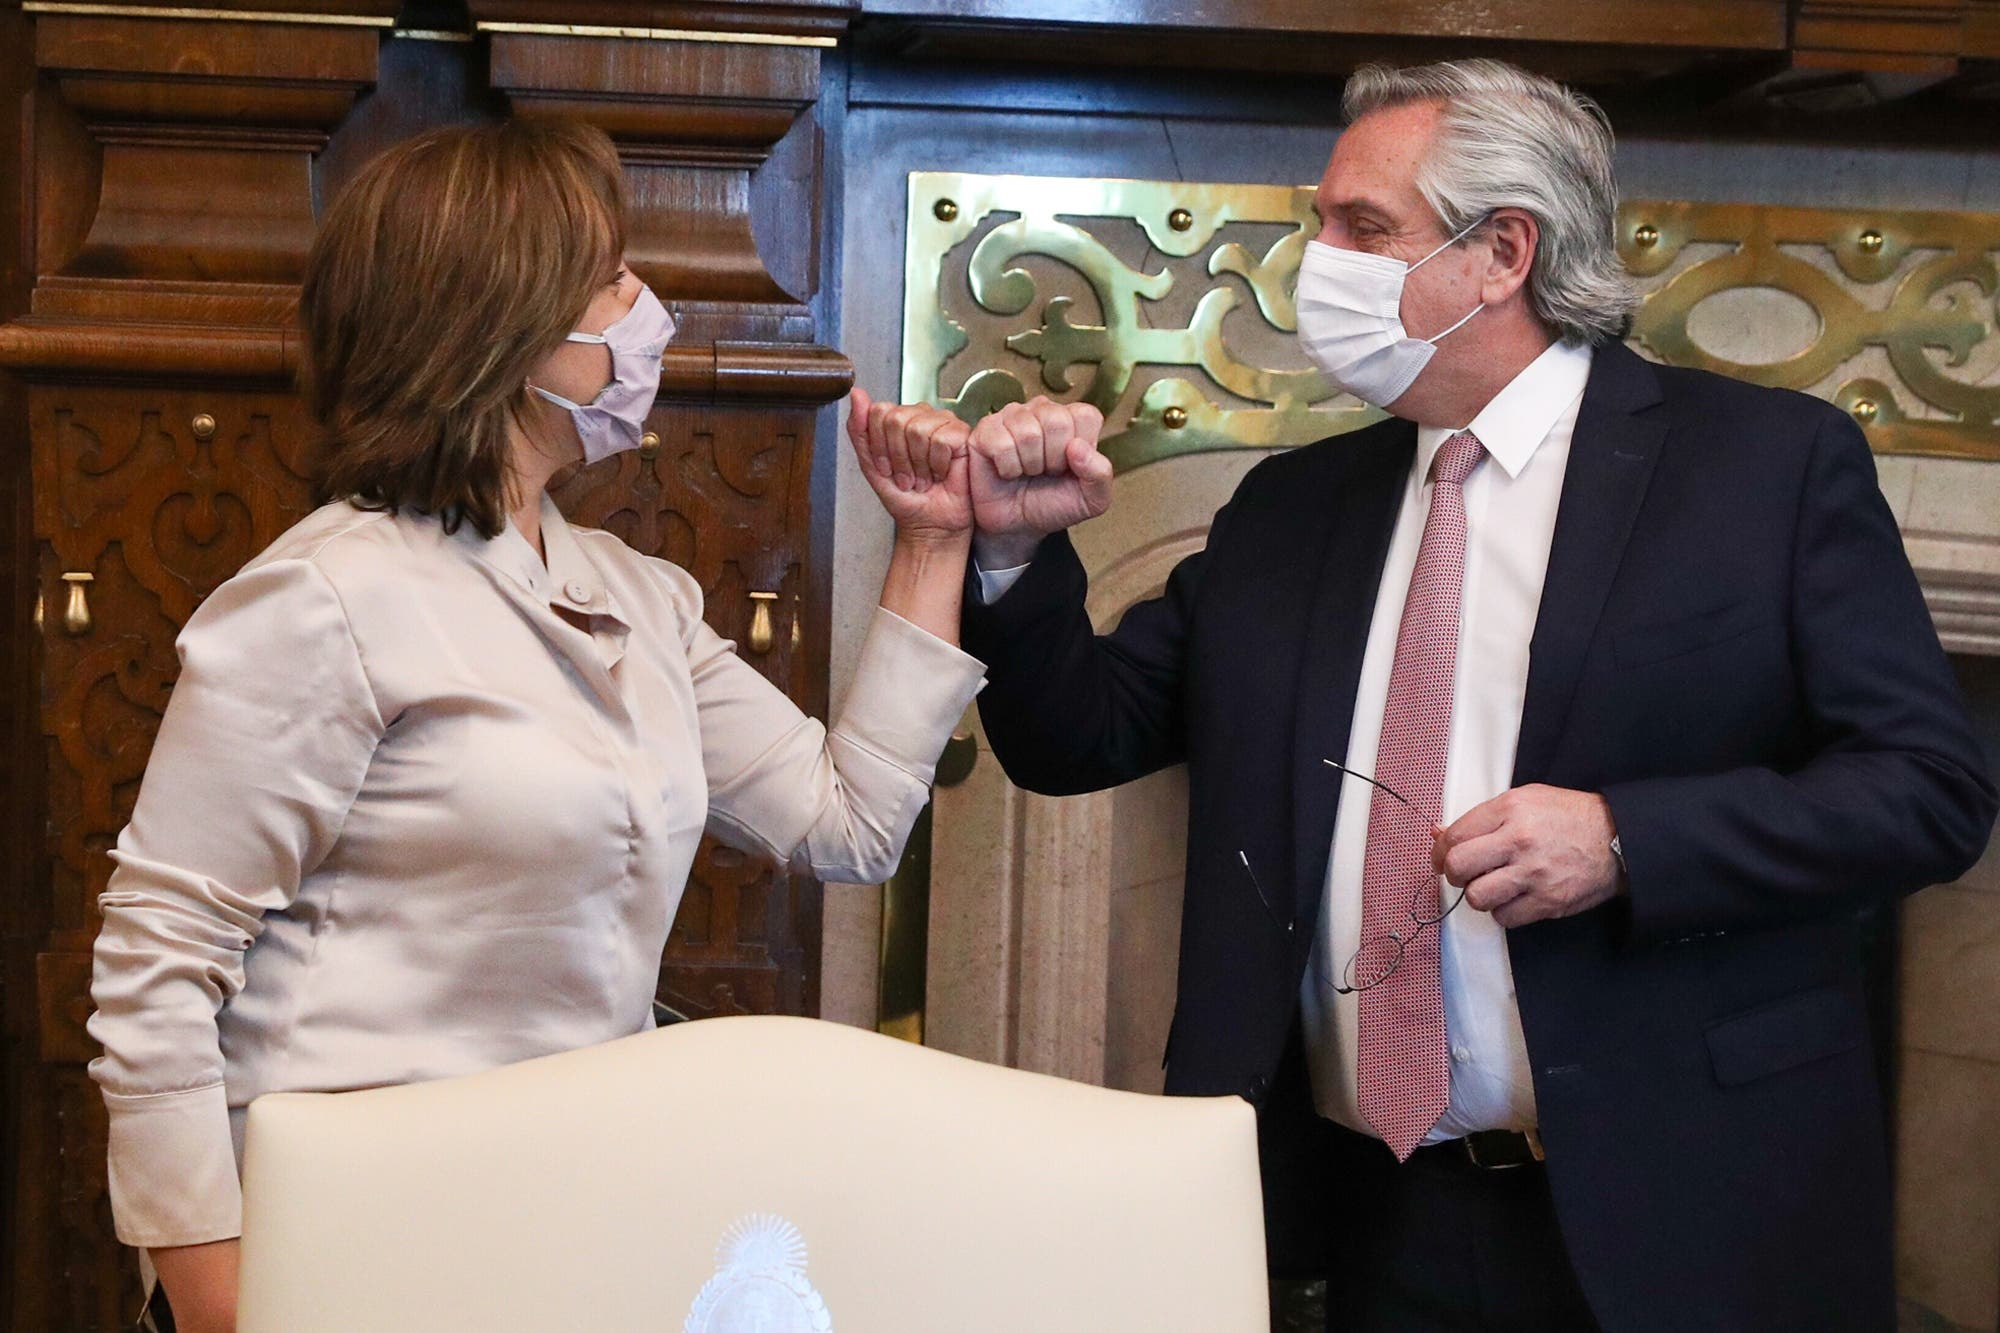 Giro: Alberto Fernández puso a la ministra de Justicia al frente del conflicto mapuche, tras reunirse con Arabela Carreras